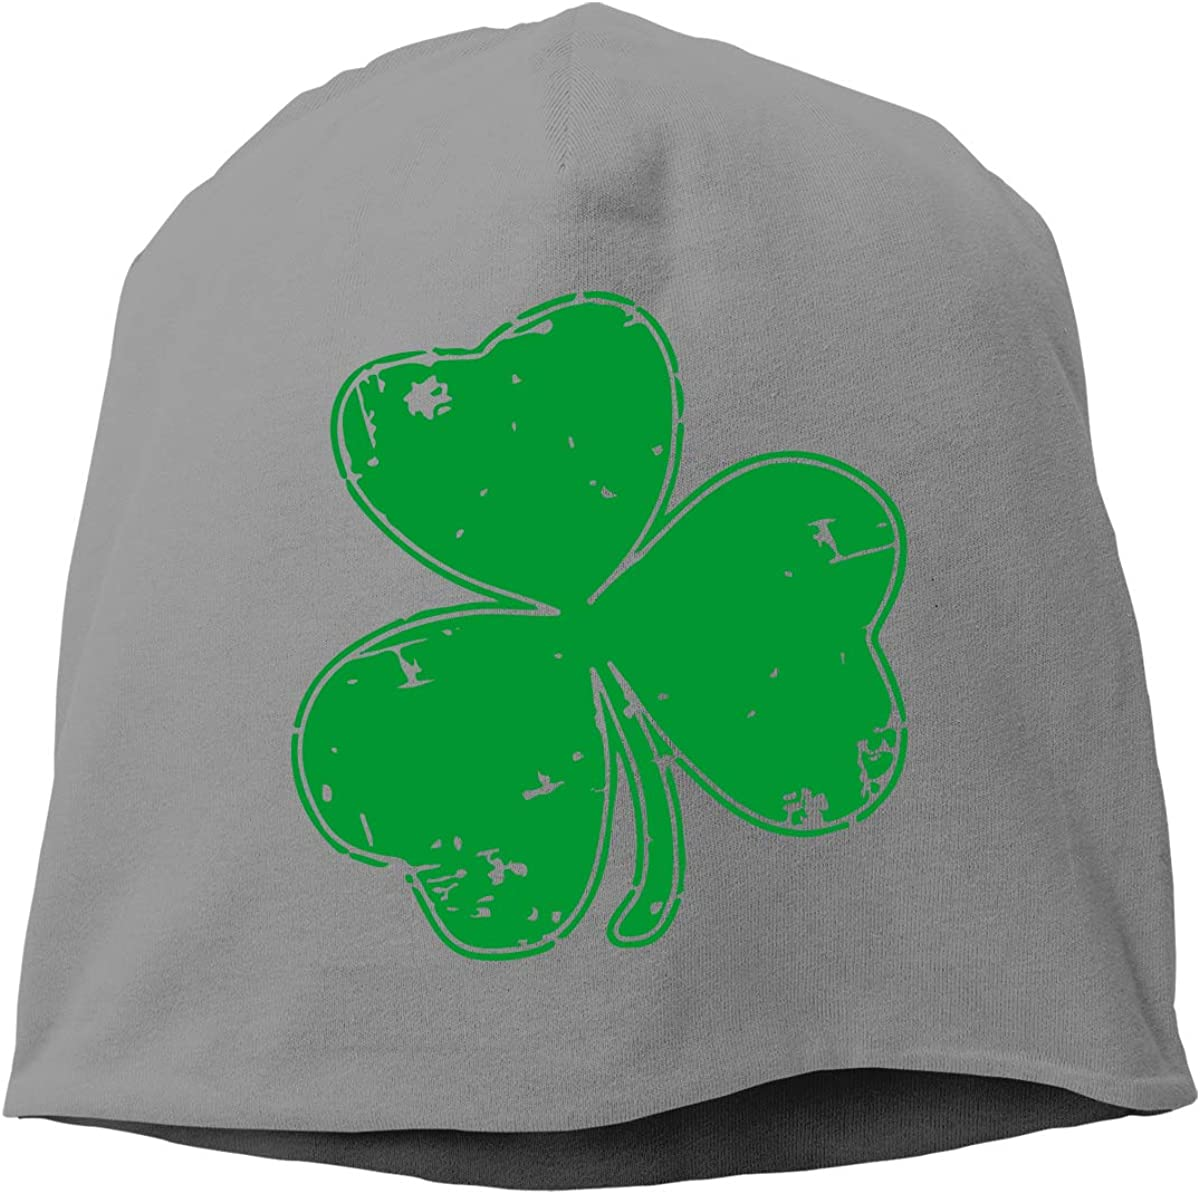 TLPM9LKMBM Irish Shamrock Beanie Skull Cap for Women and Men Winter Warm Knit Hat